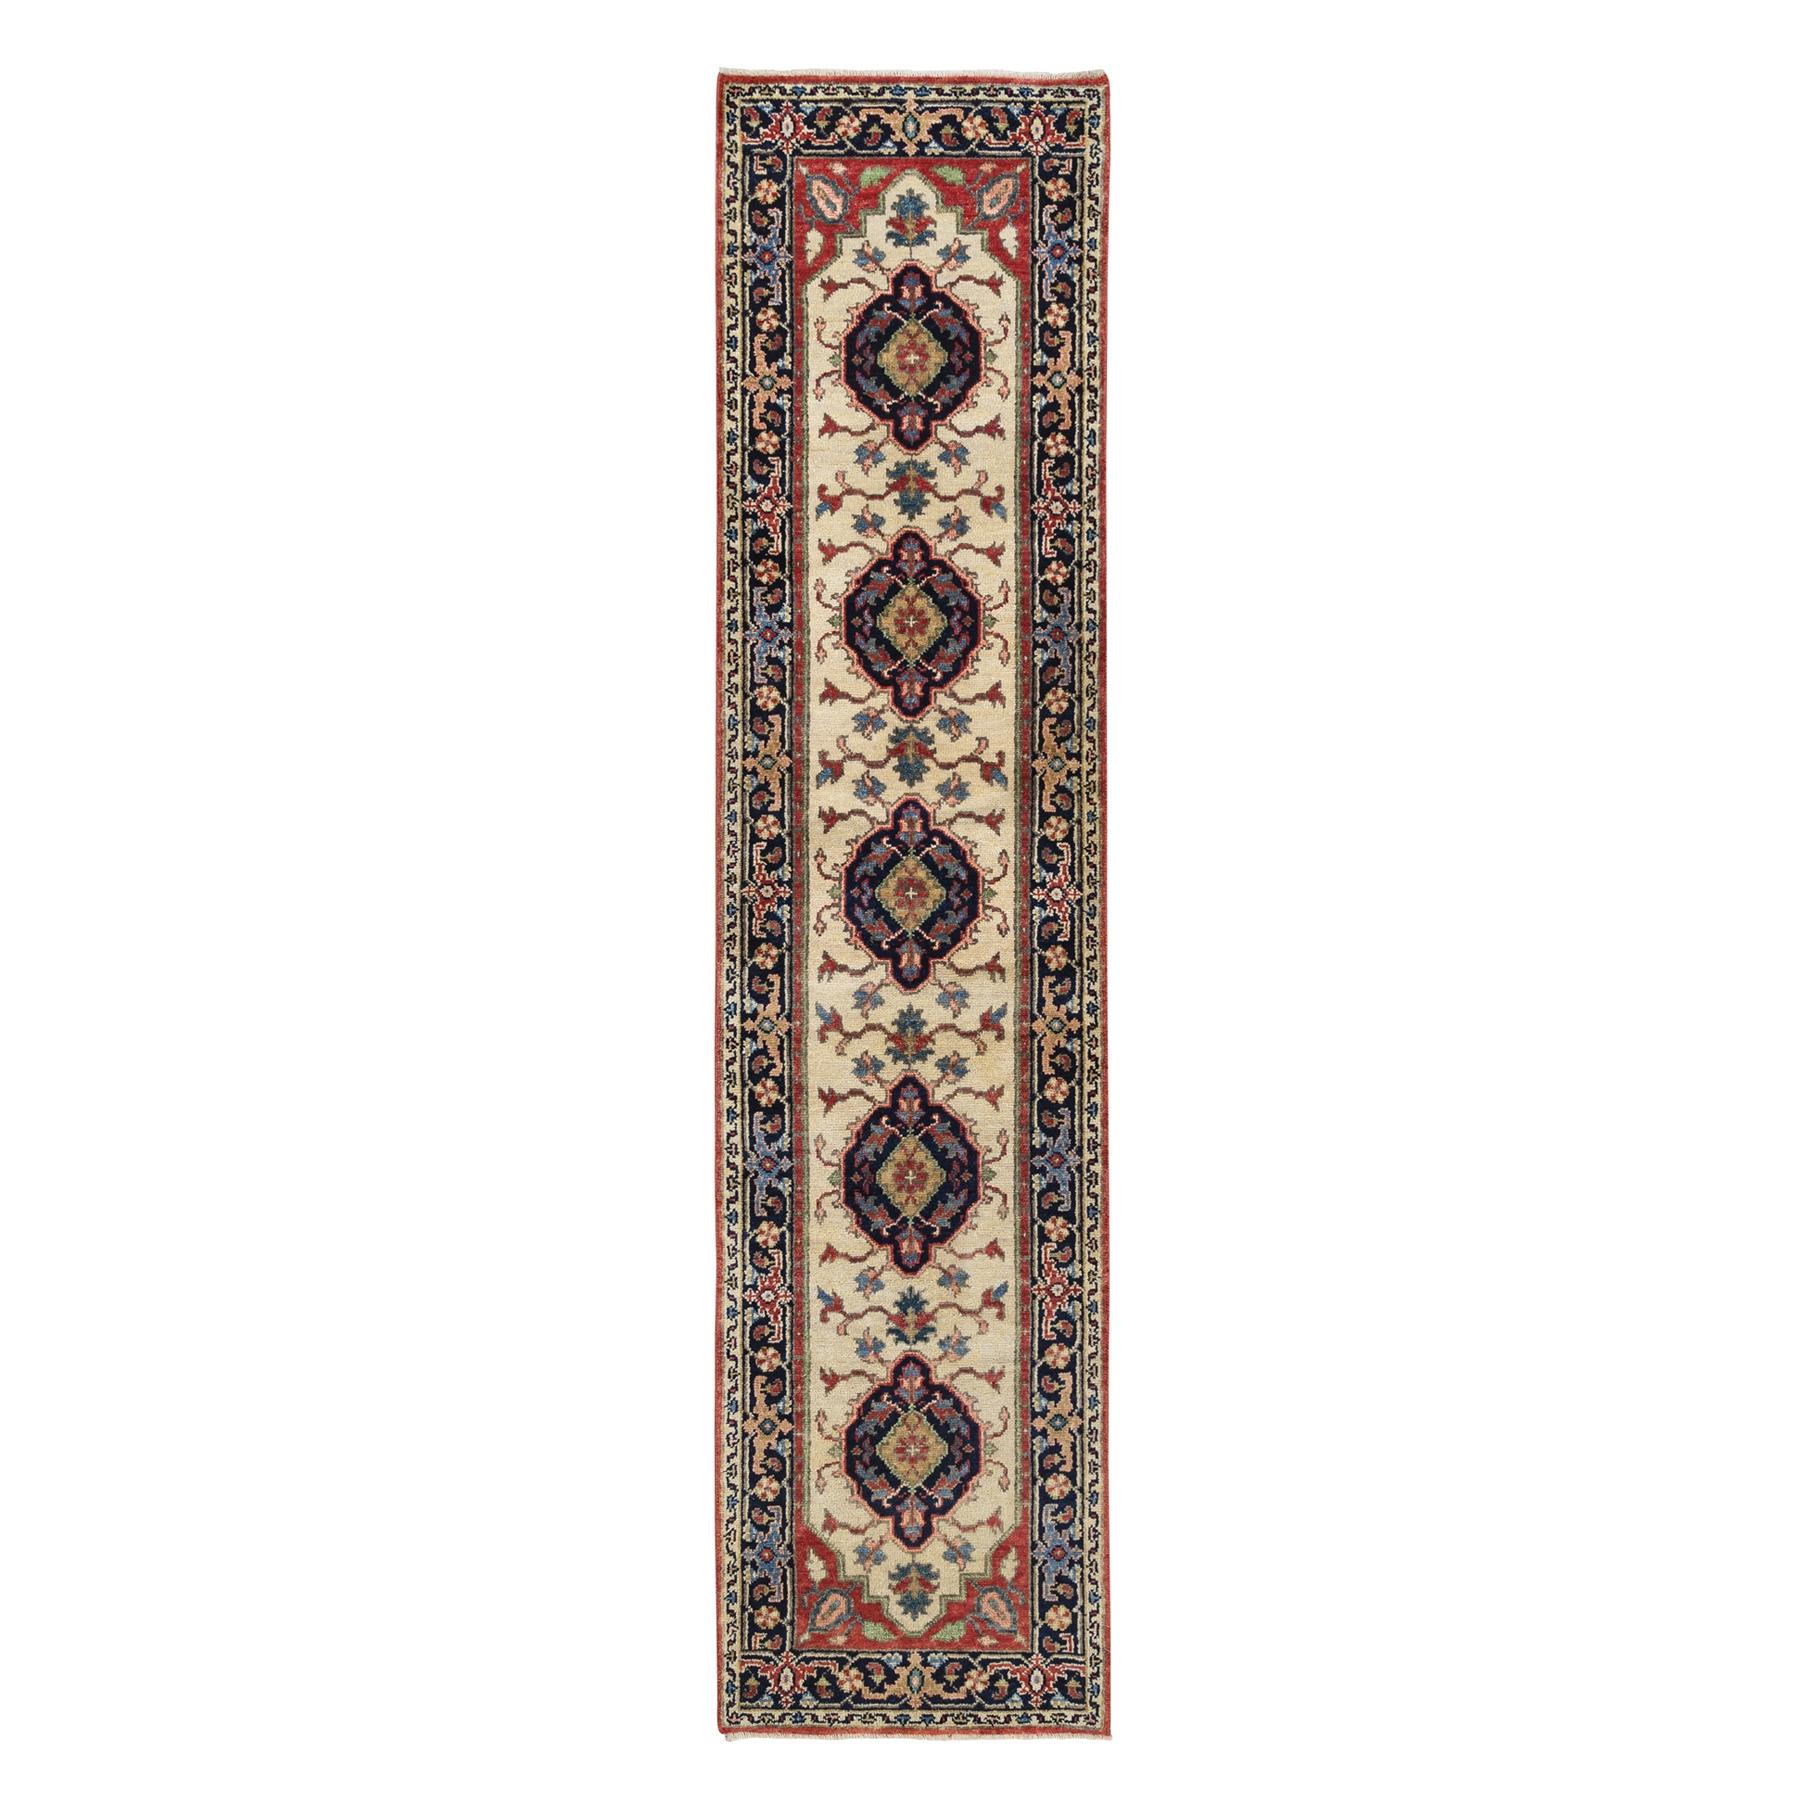 Serapi Heriz and Bakhshayesh Collection Hand Knotted Ivory Rug No: 1126350